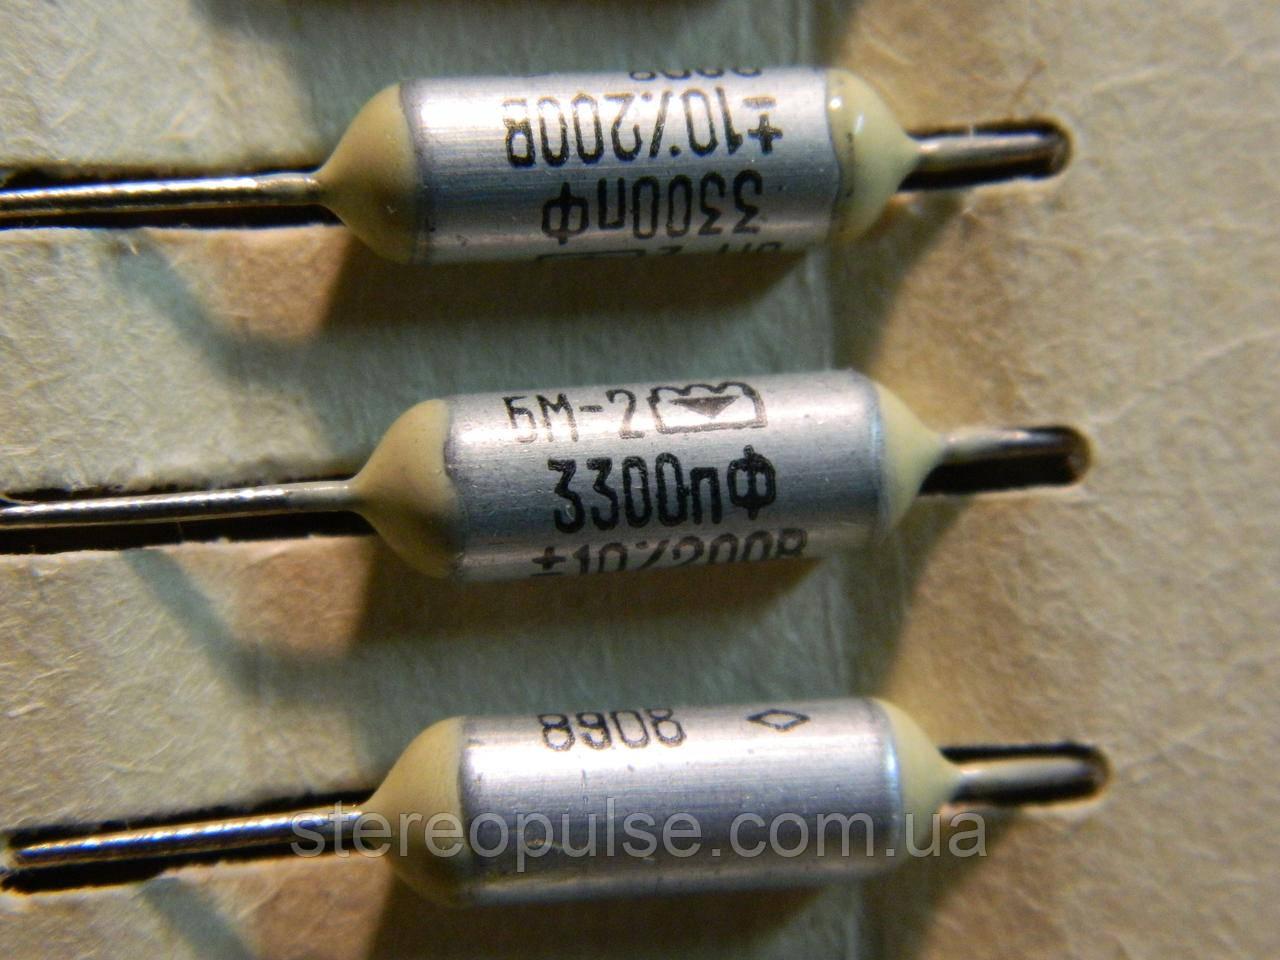 Конденсатор  БМ - 2    3300 пкФ - 200 Вольт    10%